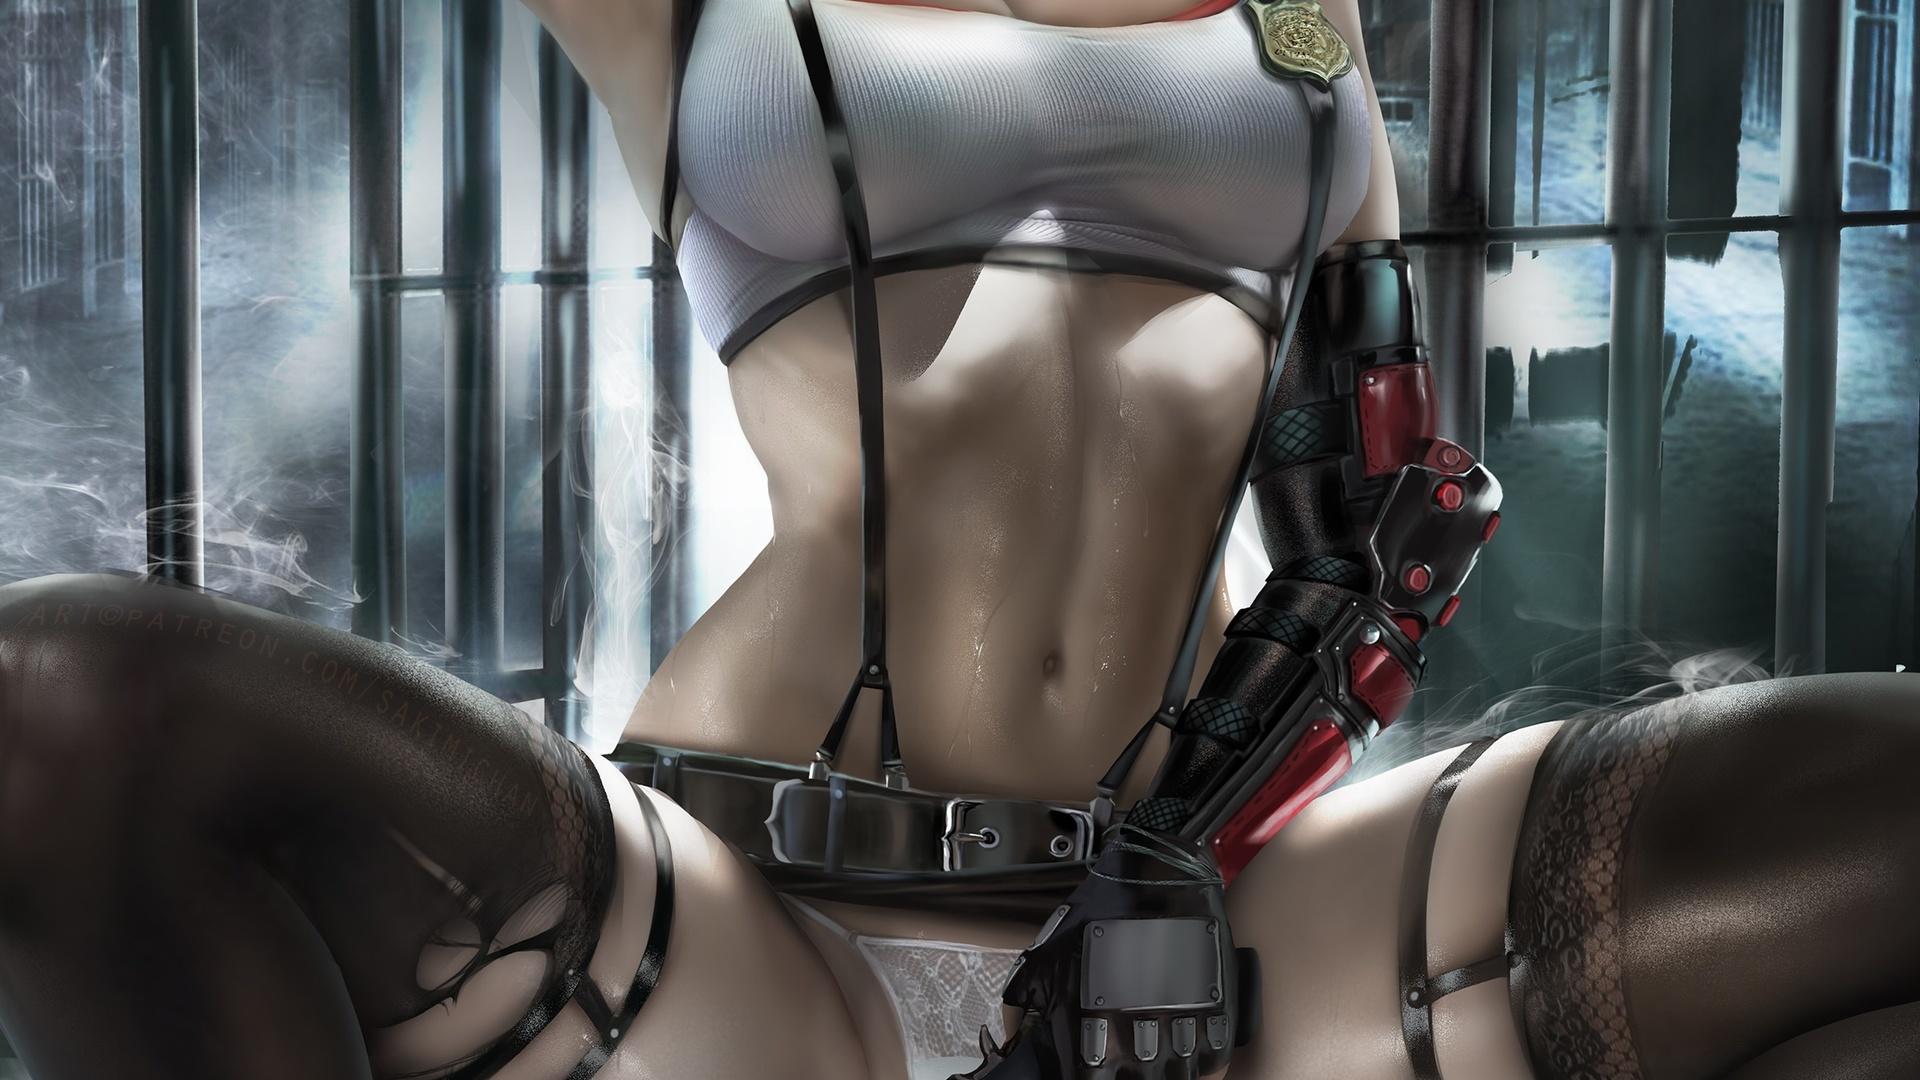 art, girl, anime, sexy, tifa, ada wong, game, resident evil